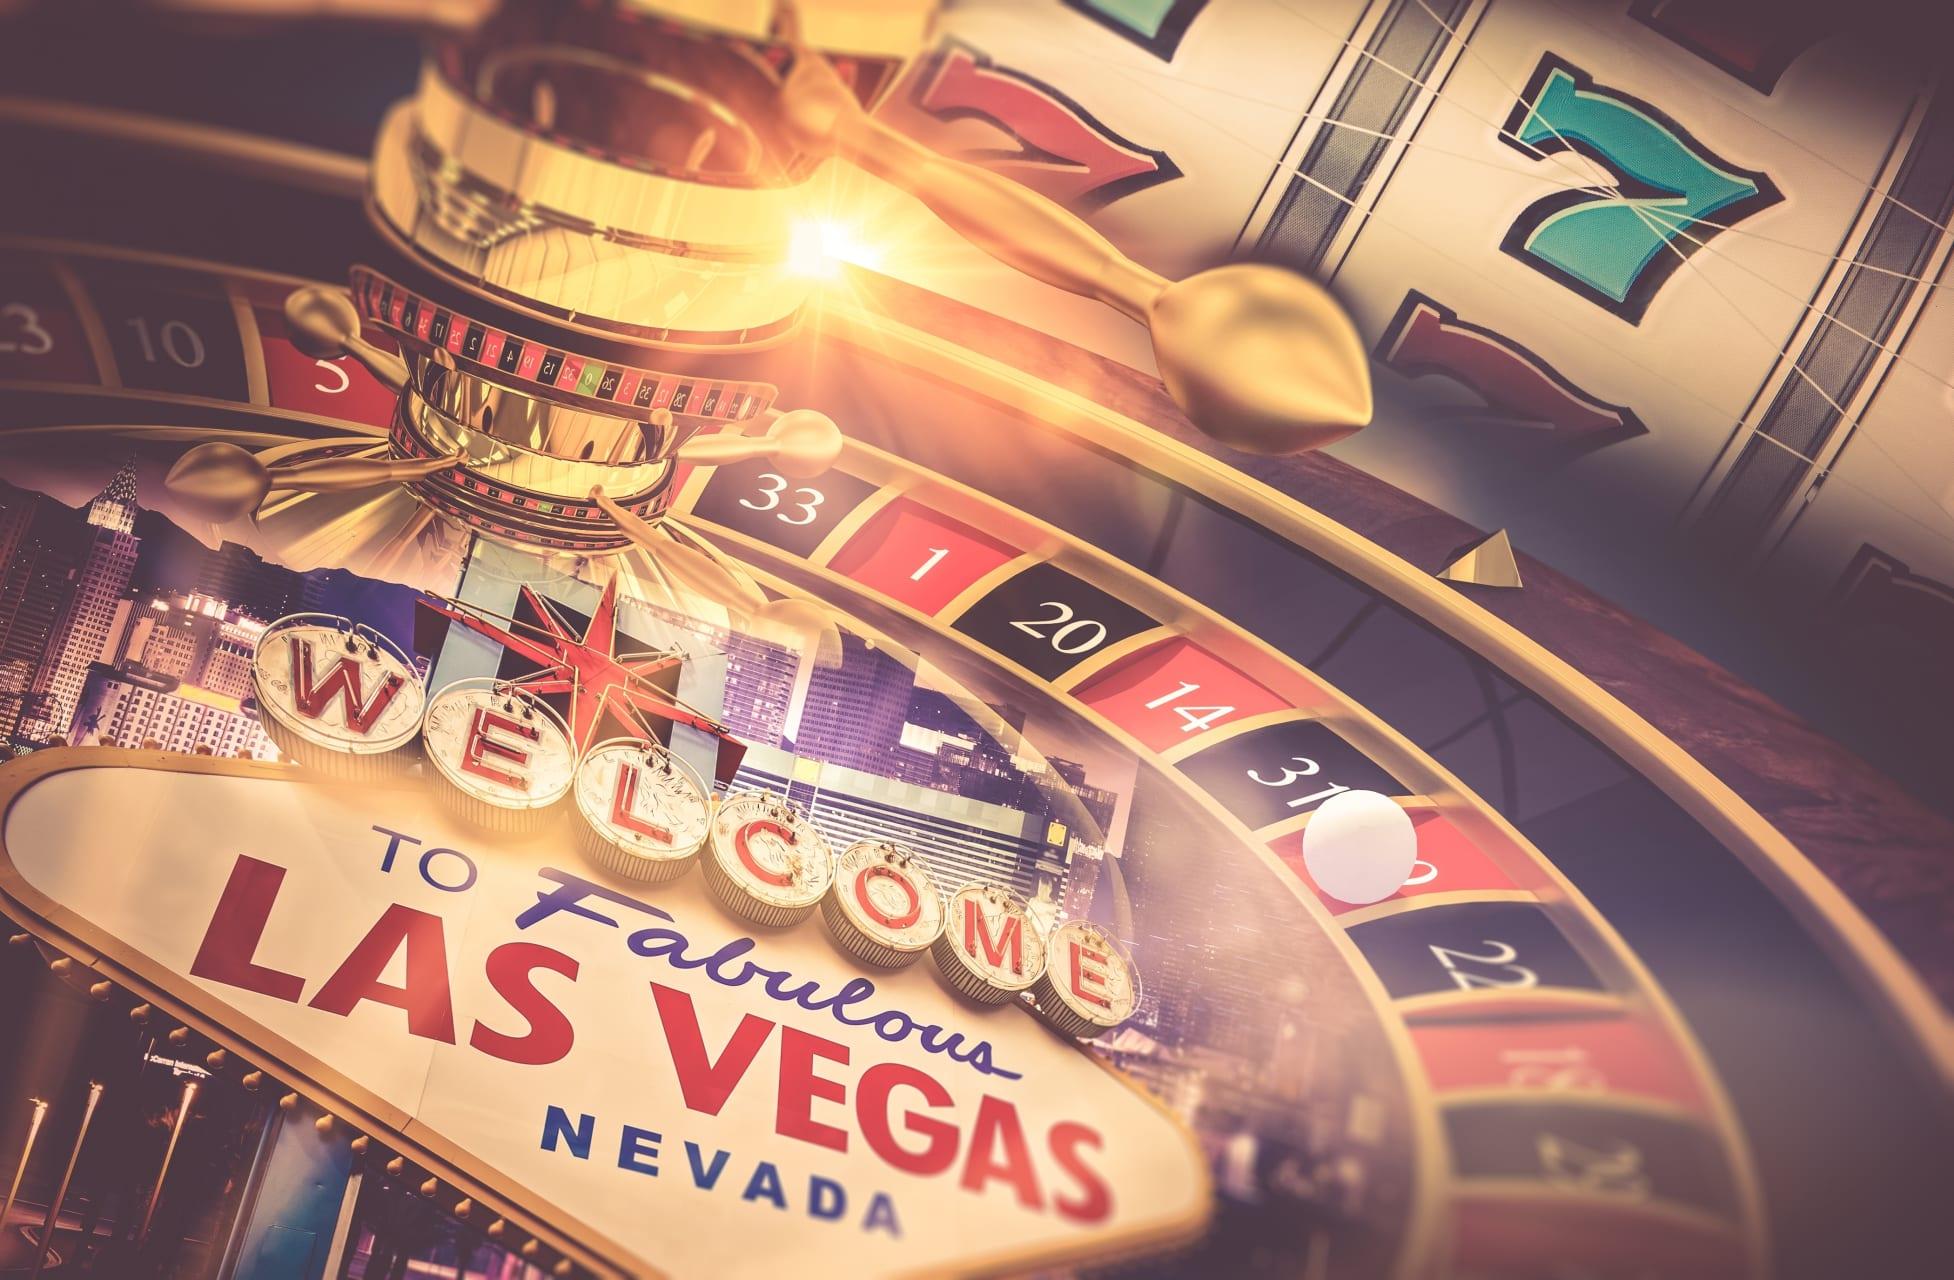 Las Vegas - Las Vegas Casino Games & Gambling